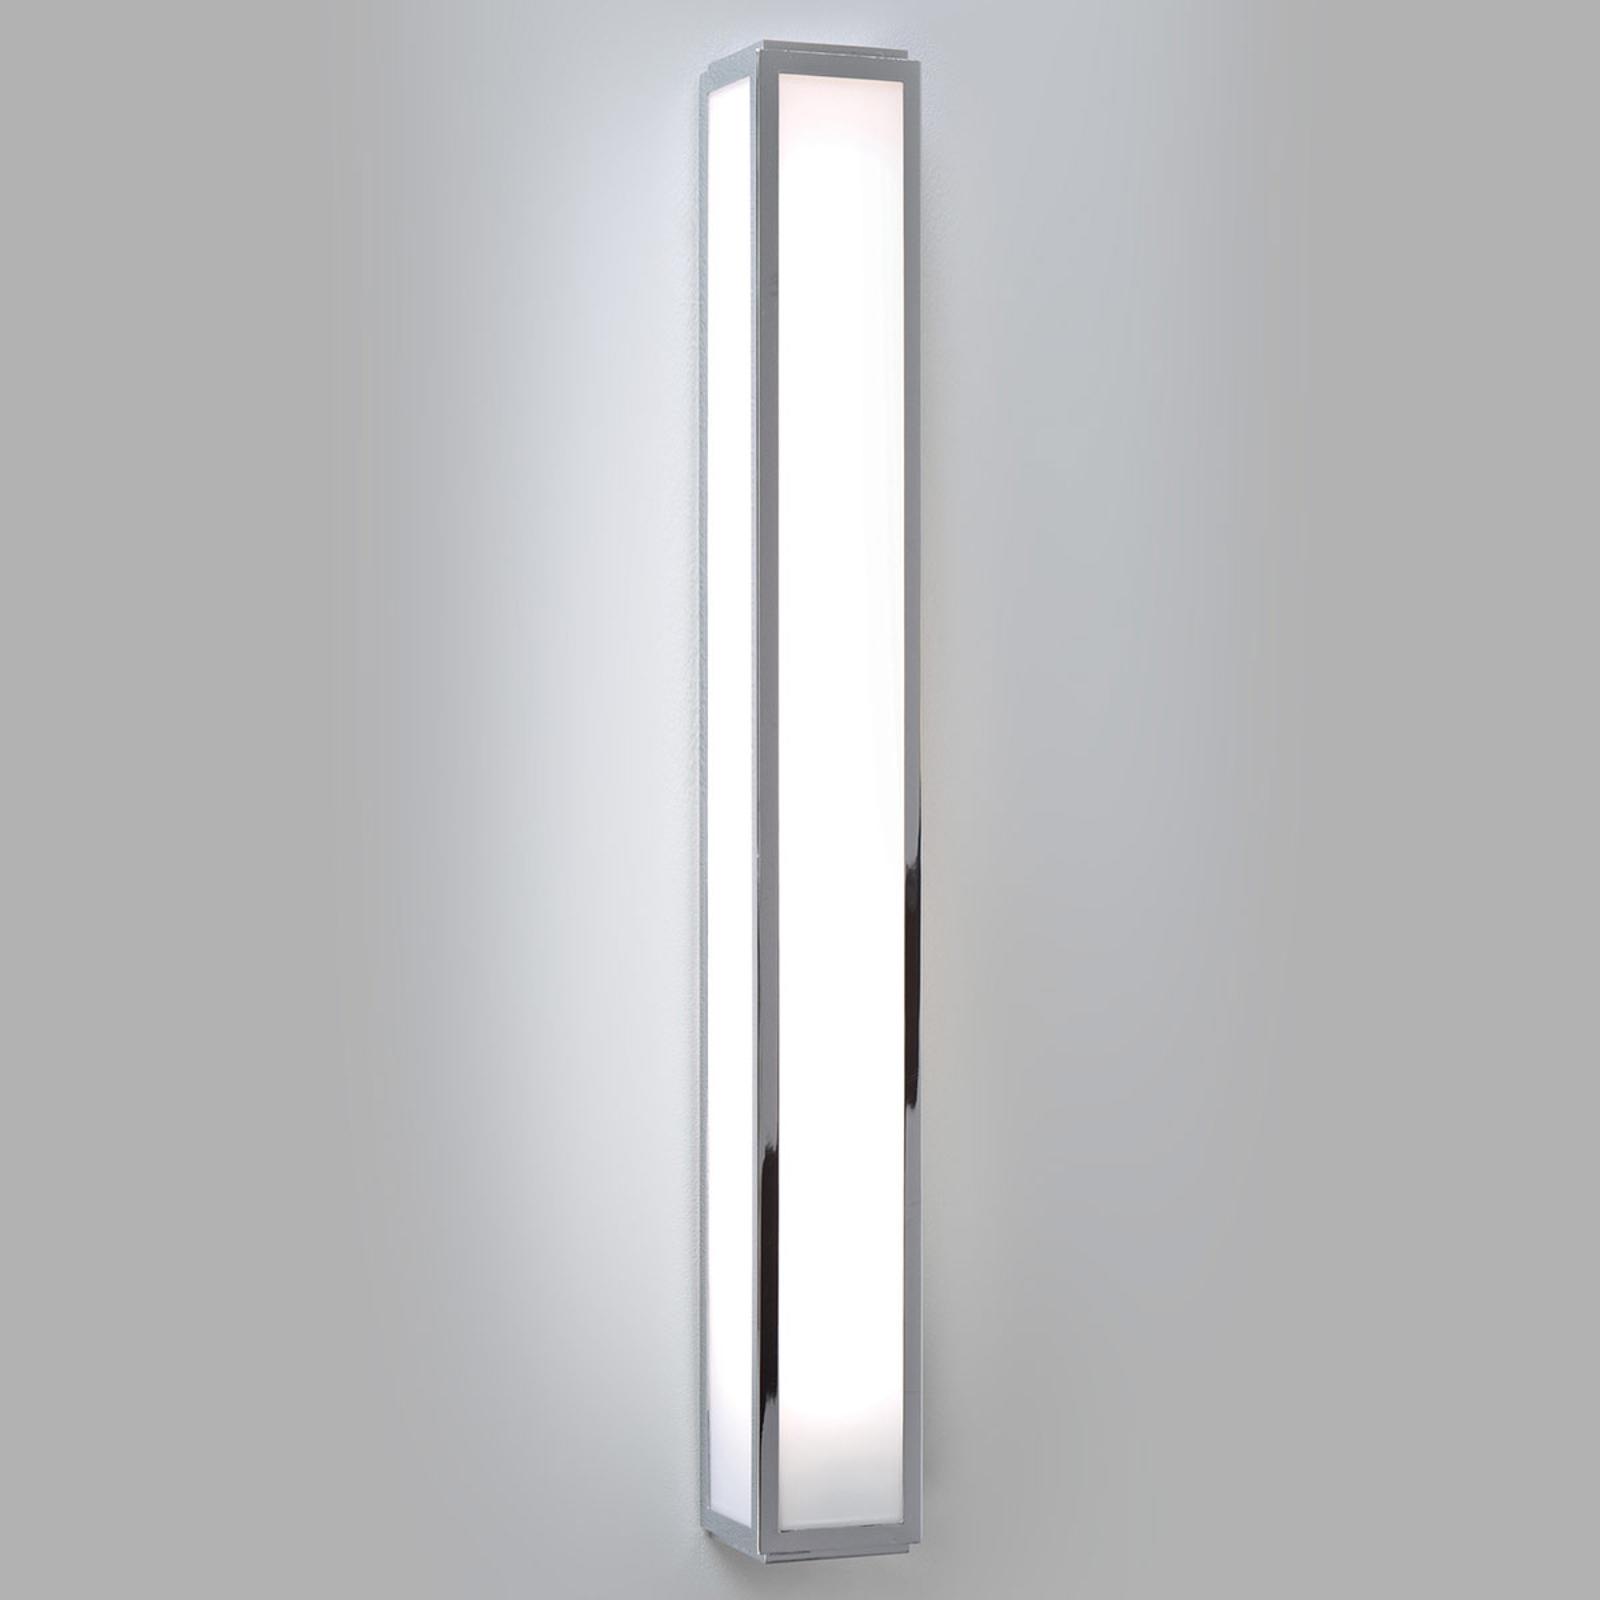 Applique LED allongée MASHIKO 600 LED